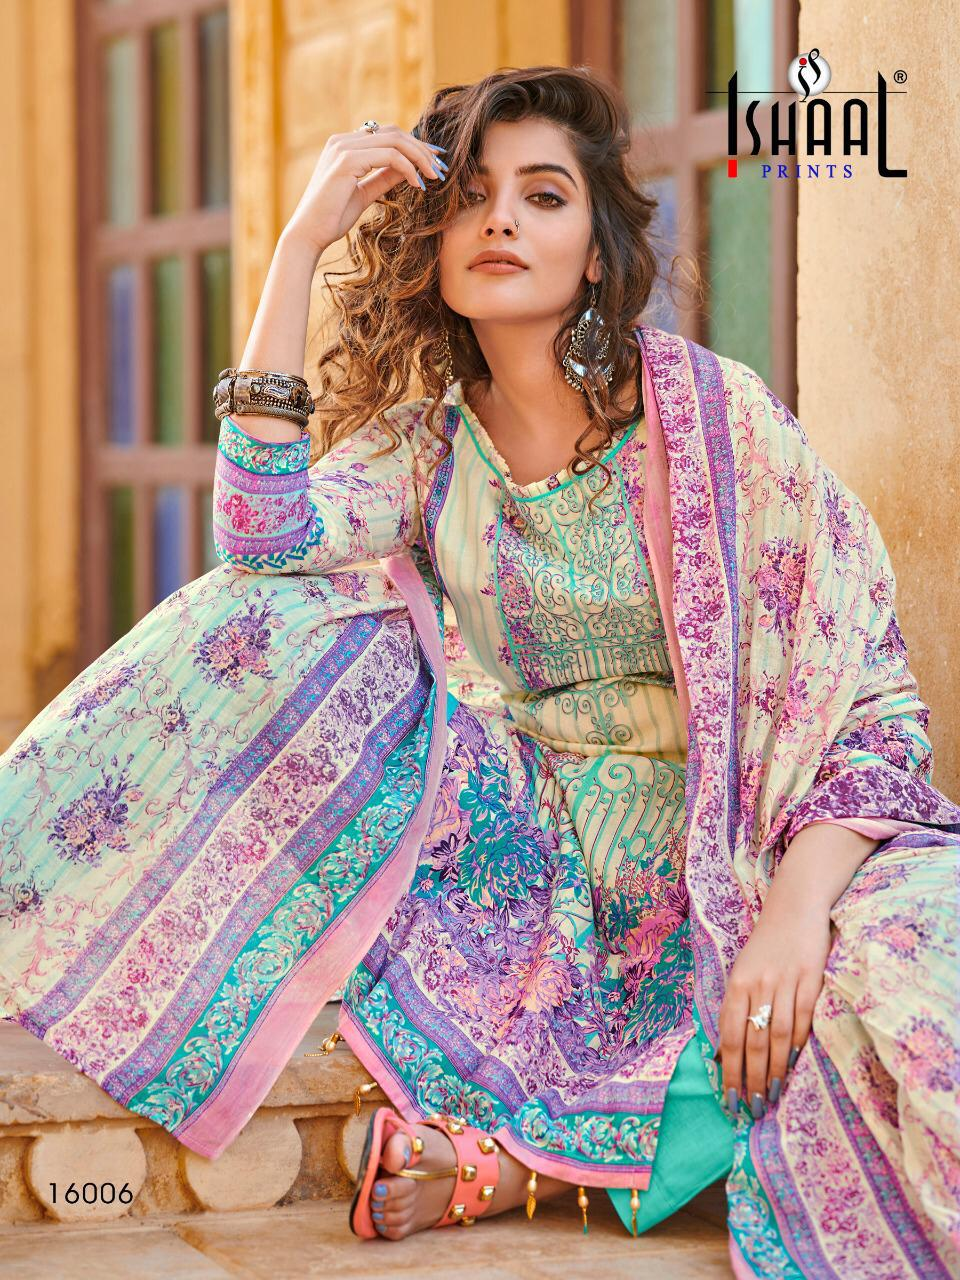 Ishaal Print Gulmohar Vol 16 Designer Lawn Digital Printed Low Range Suits Wholesale